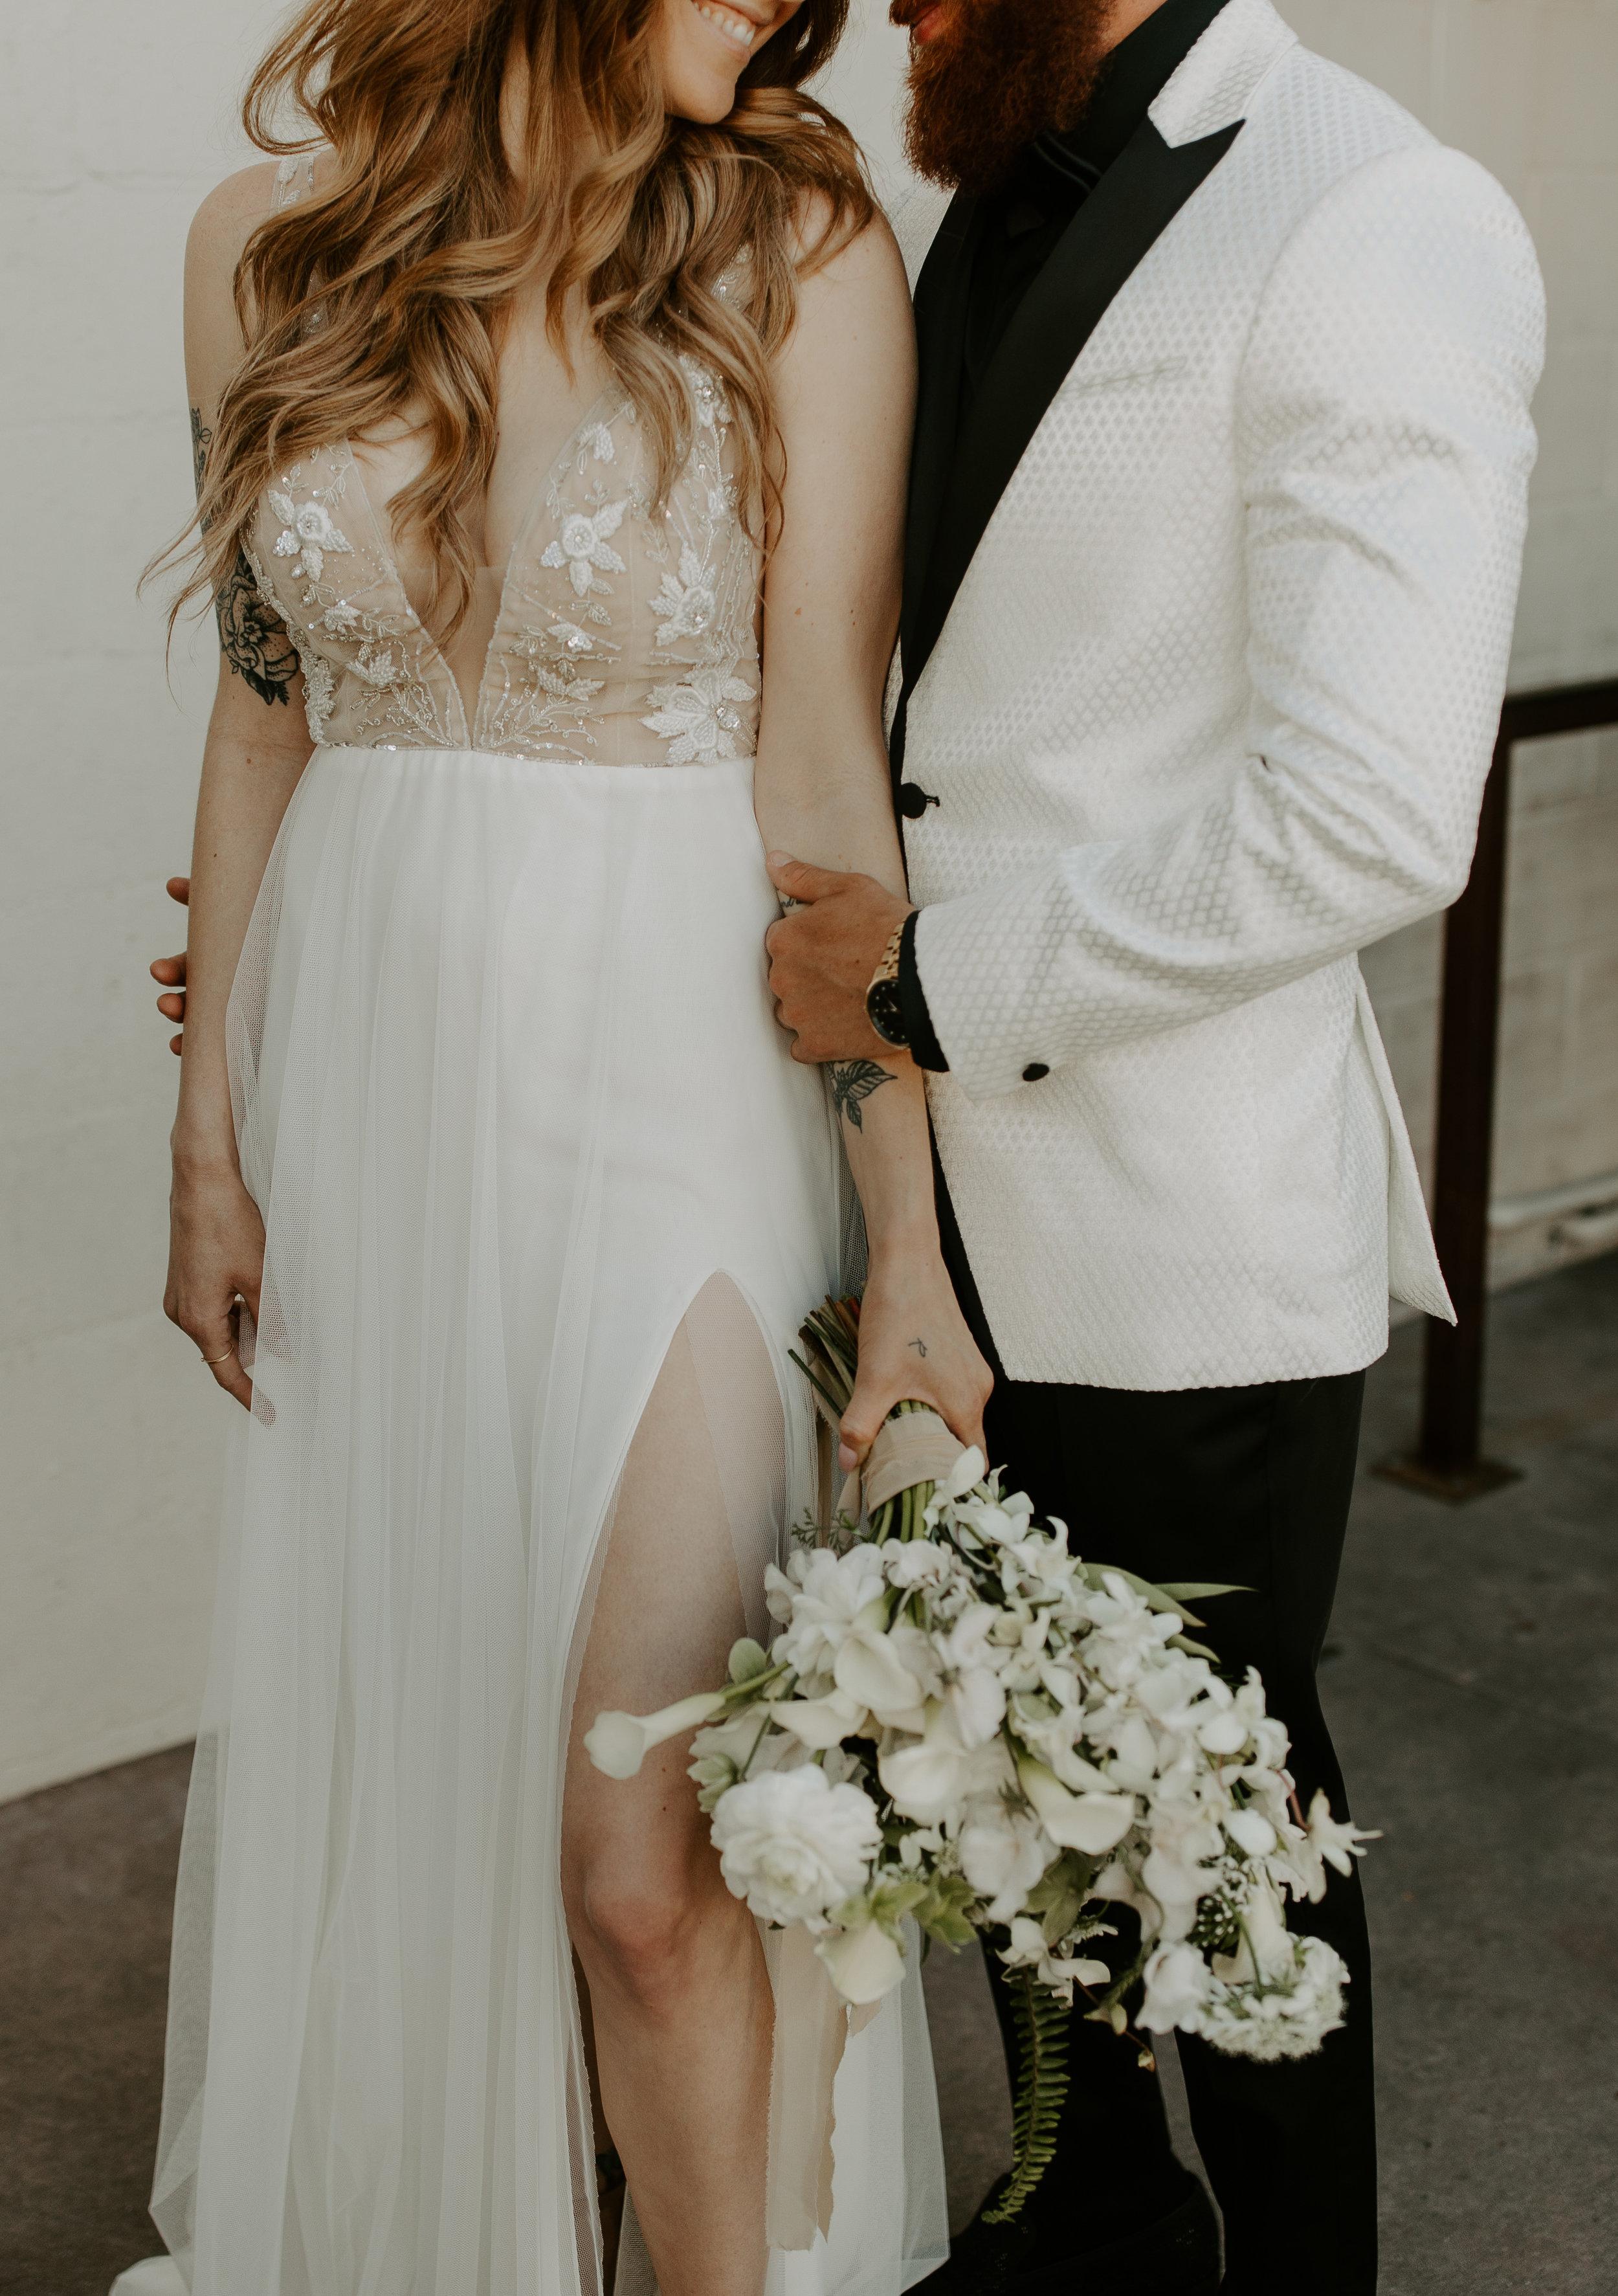 Downtown-LA-Wedding-MeganandRonny-99.jpg